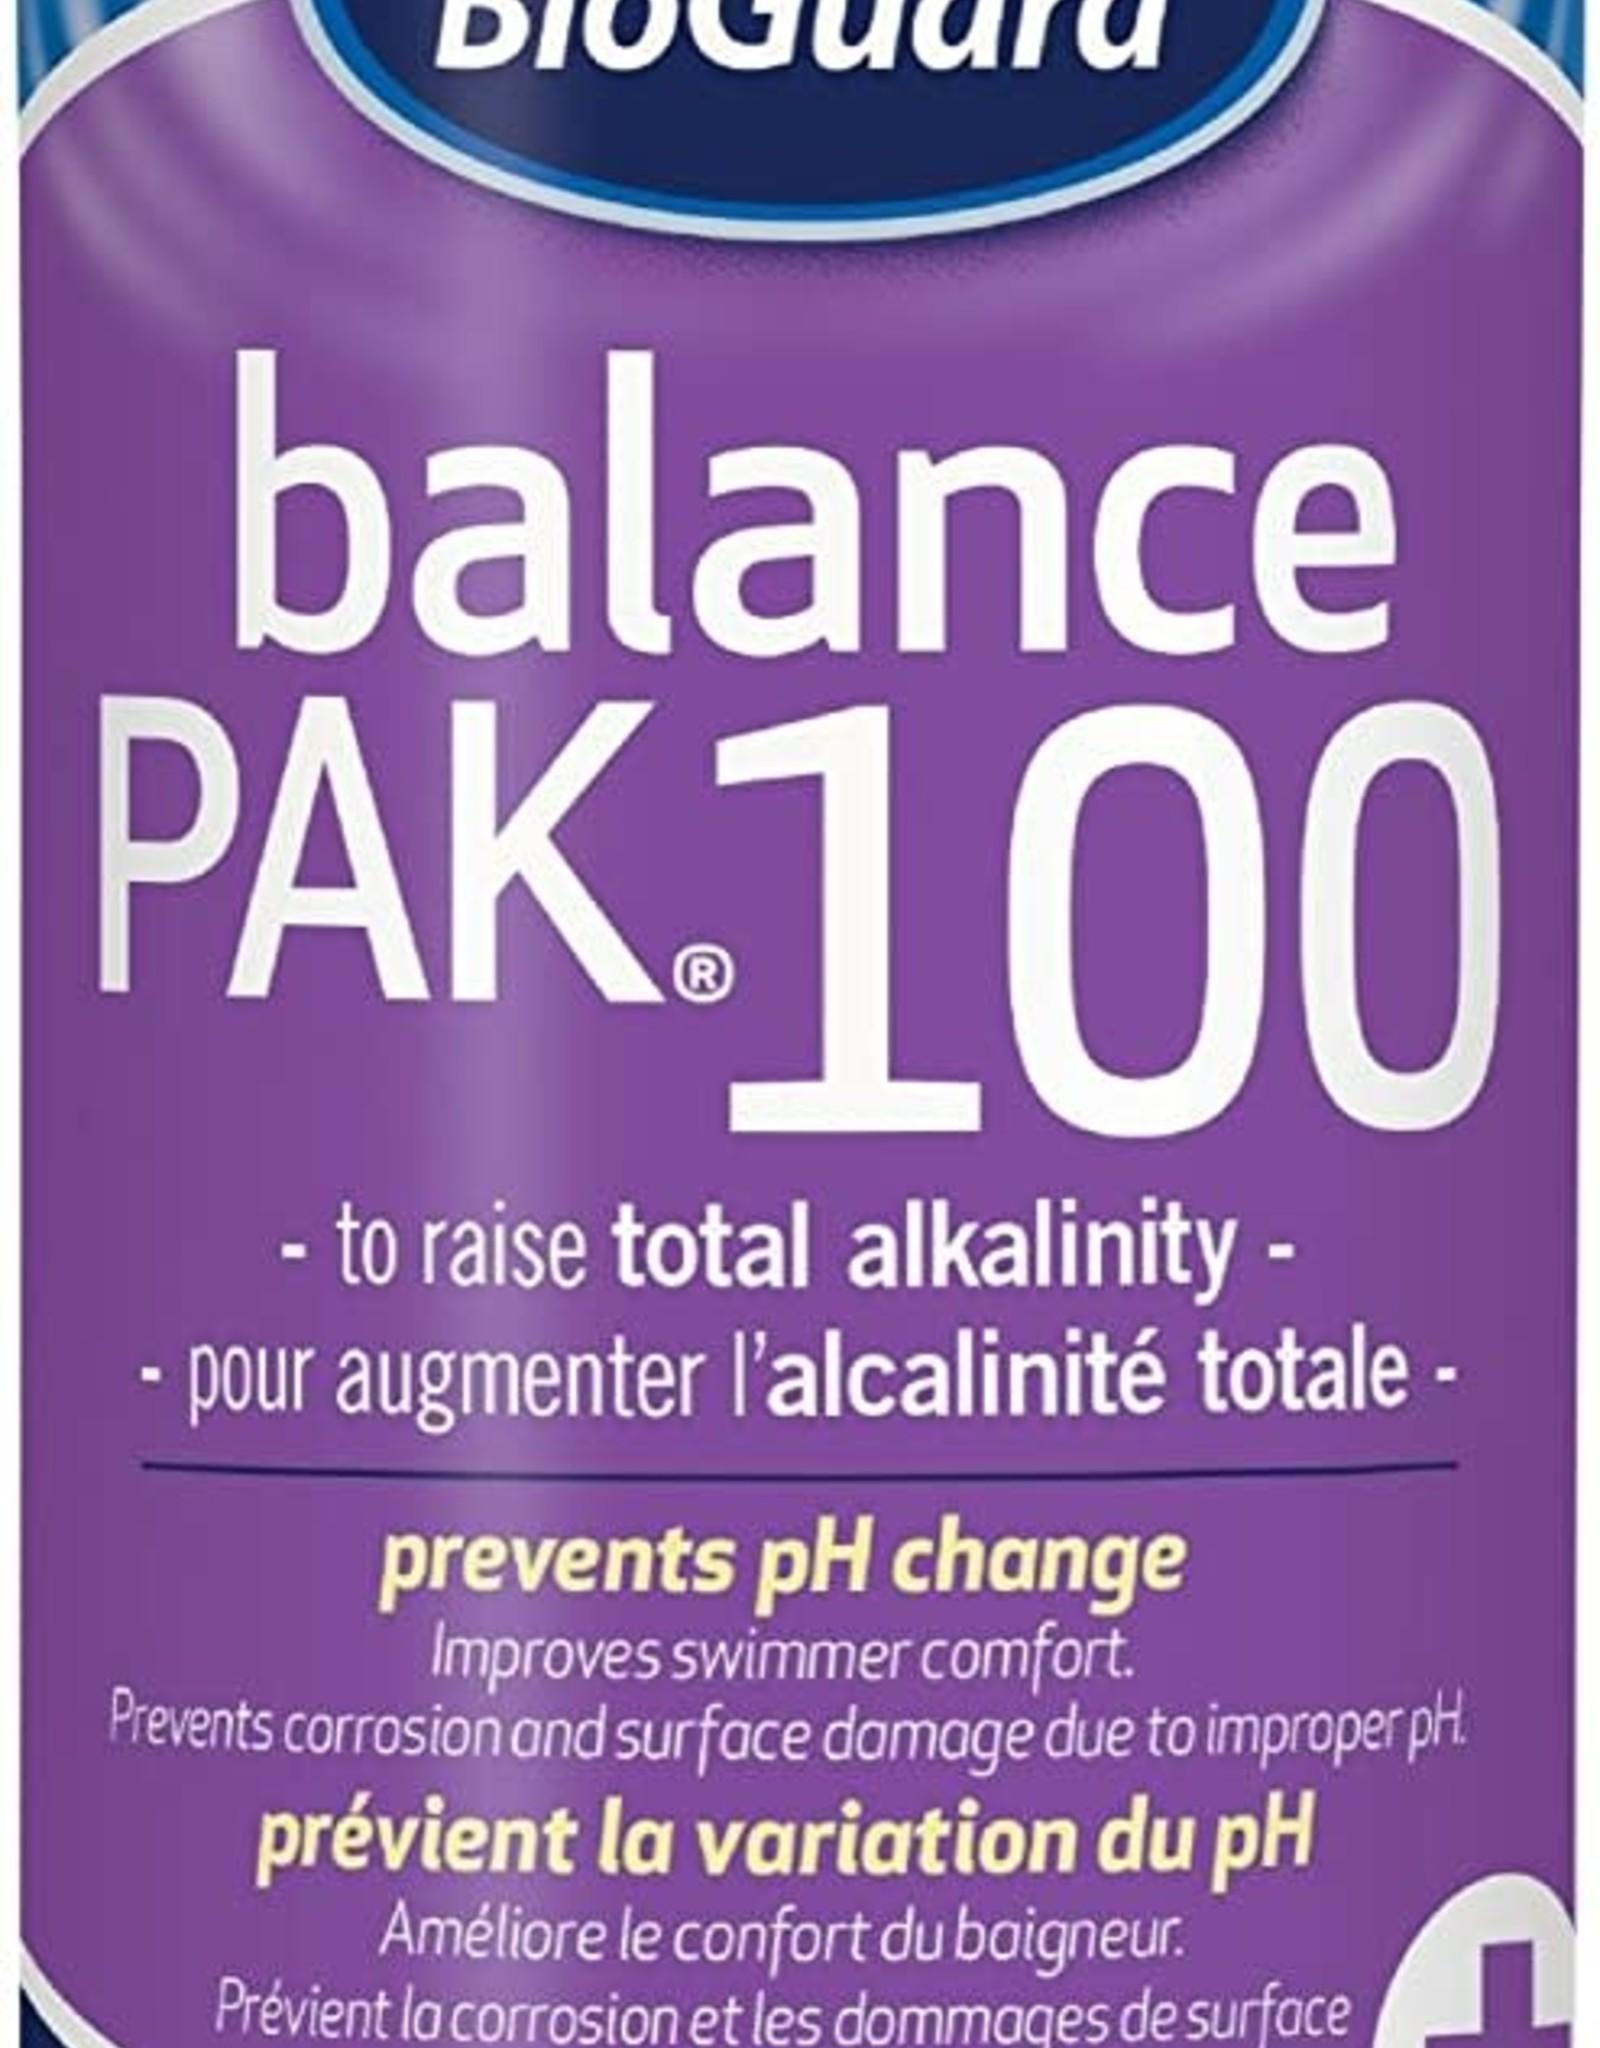 BIOGUARD BioGuard Balance Pak® 100 (1 kg)